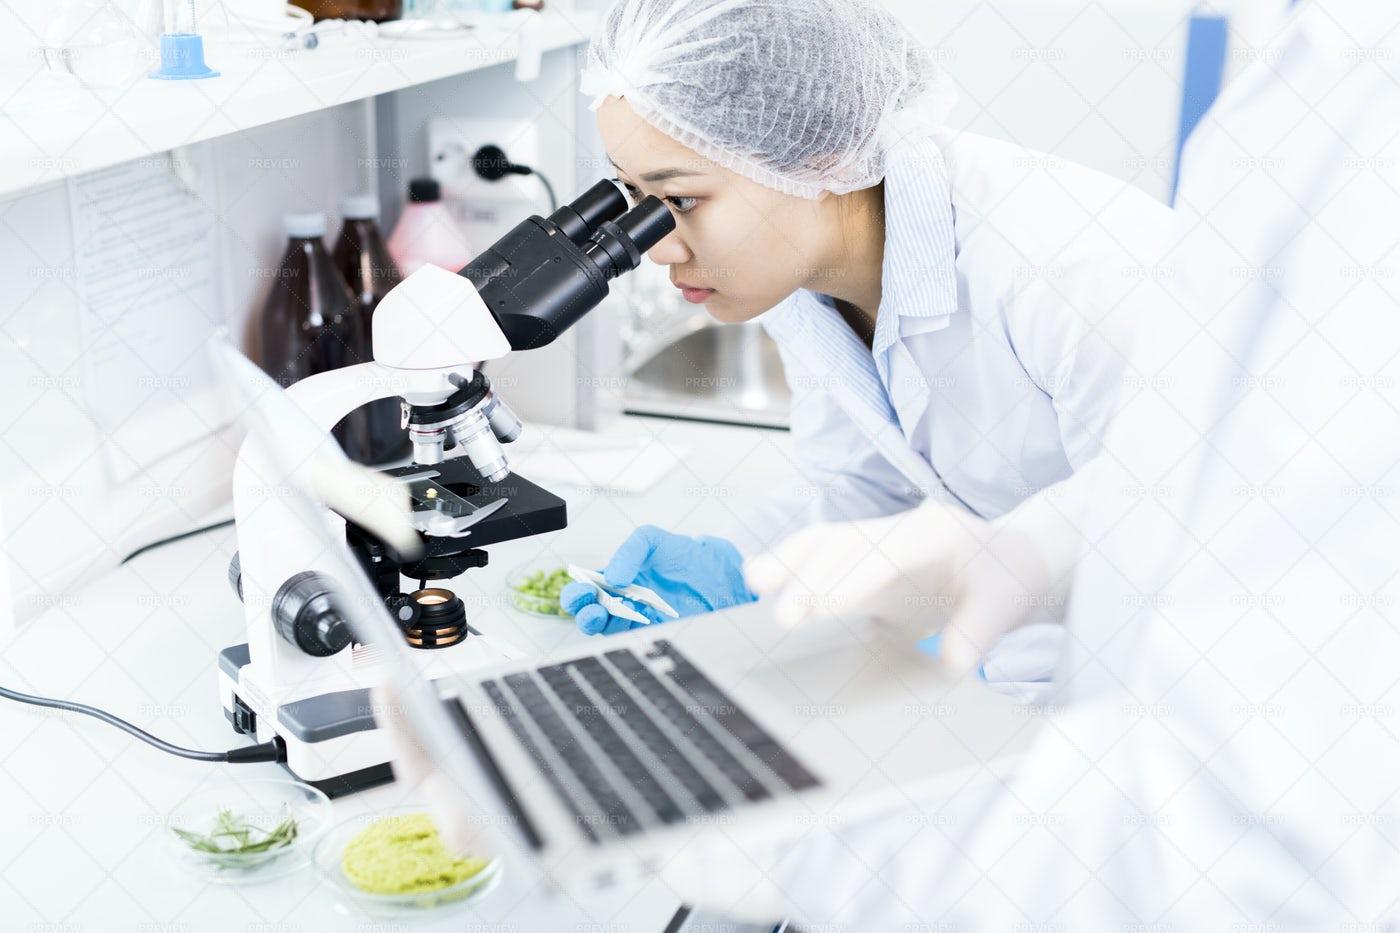 Asian Scientist Using Microscope: Stock Photos